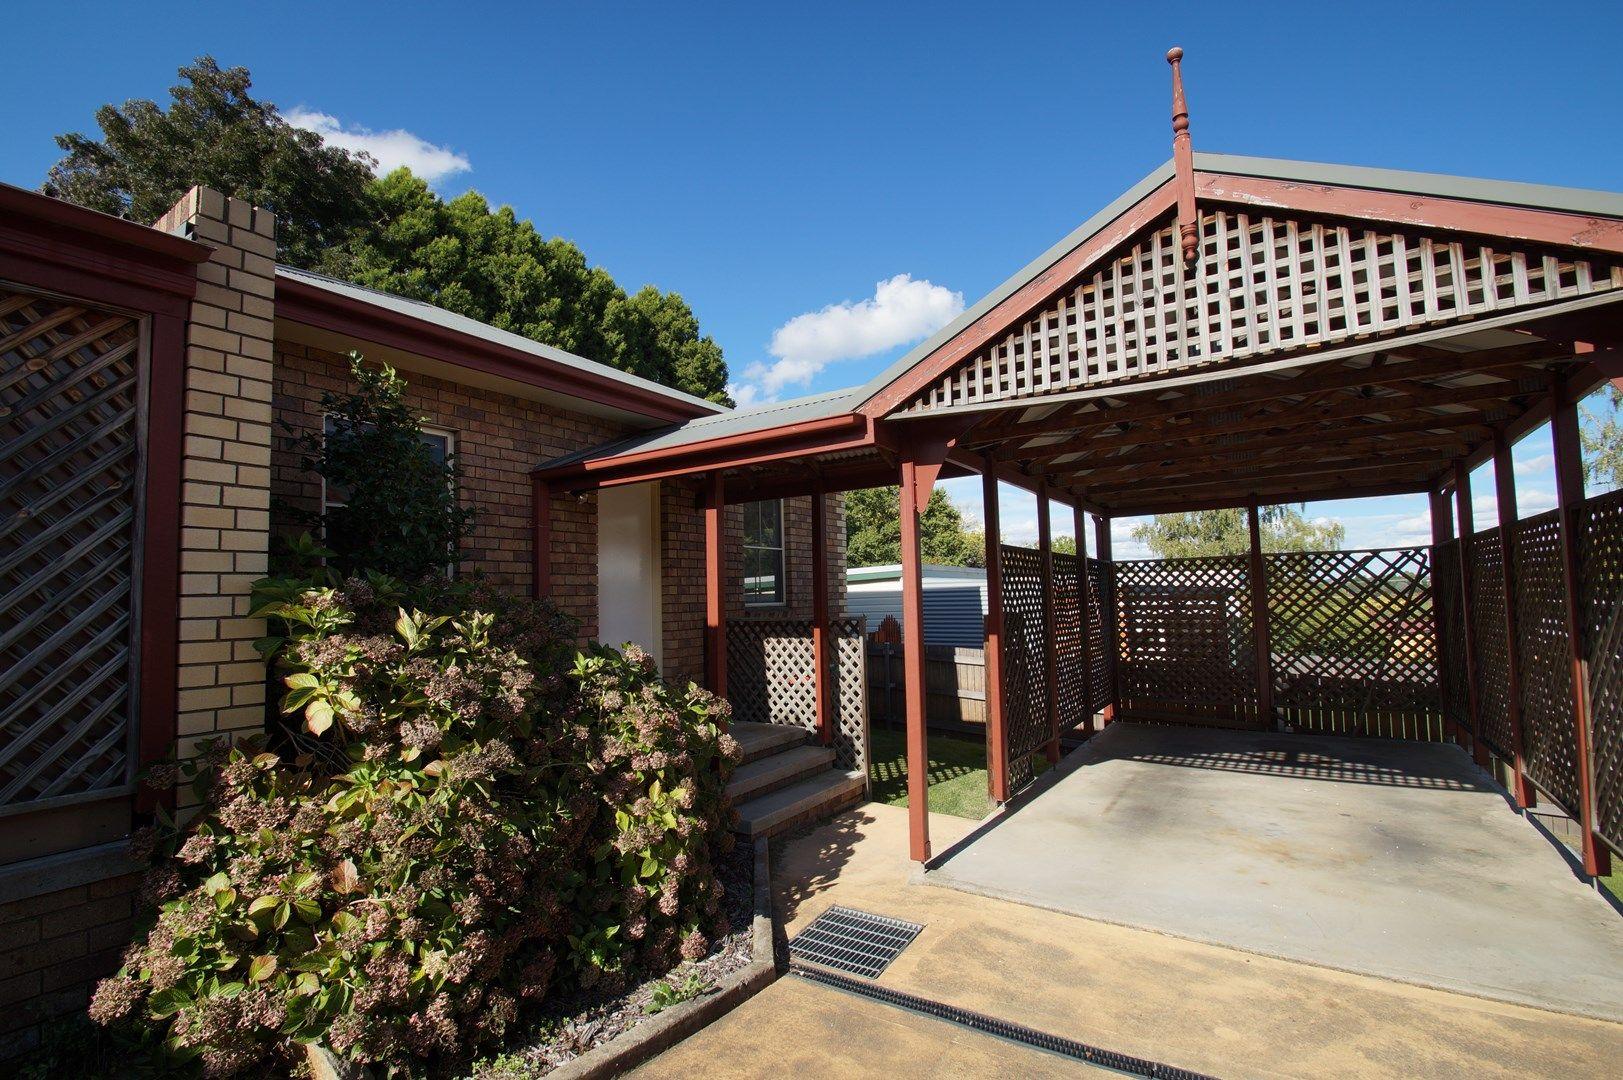 2/49 Faulkner Street, Armidale NSW 2350, Image 0